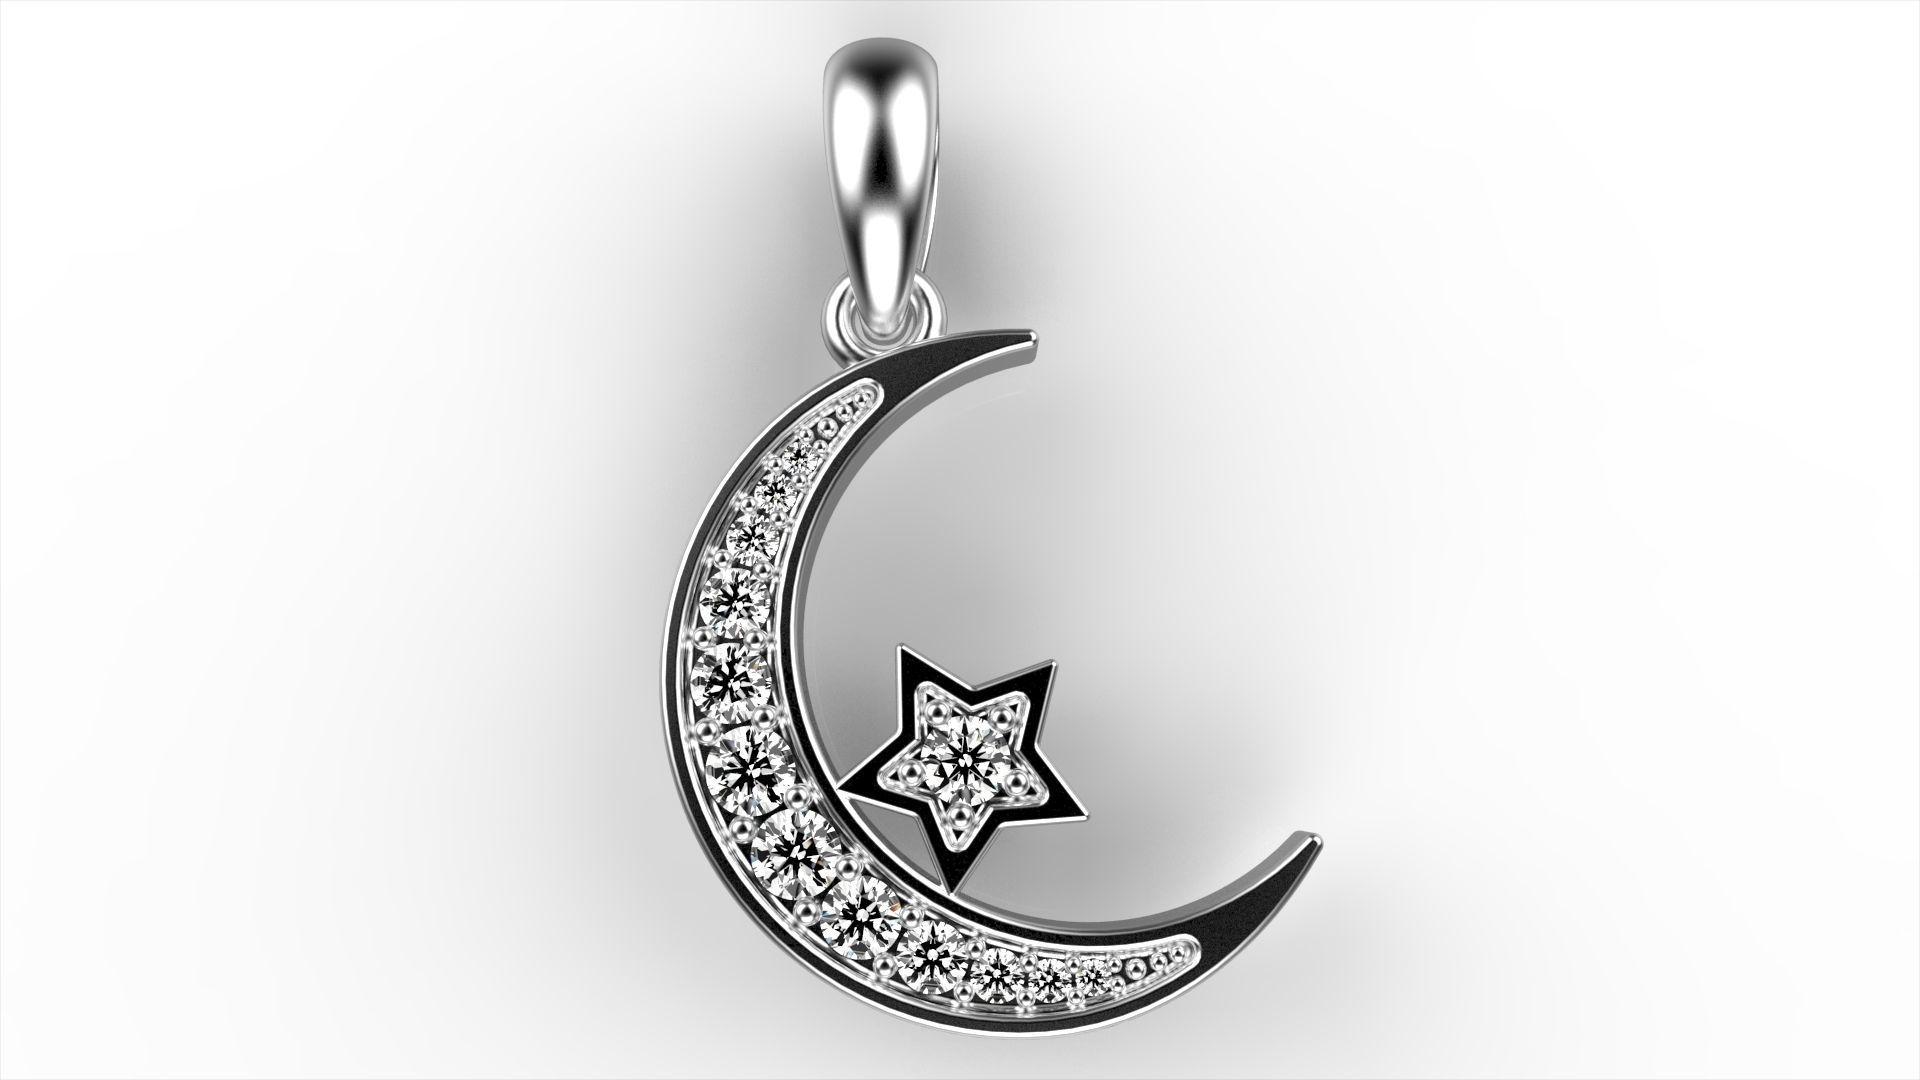 Moon star pendant 3d printable model cgtrader moon star pendant 3d model stl 3dm 1 aloadofball Images